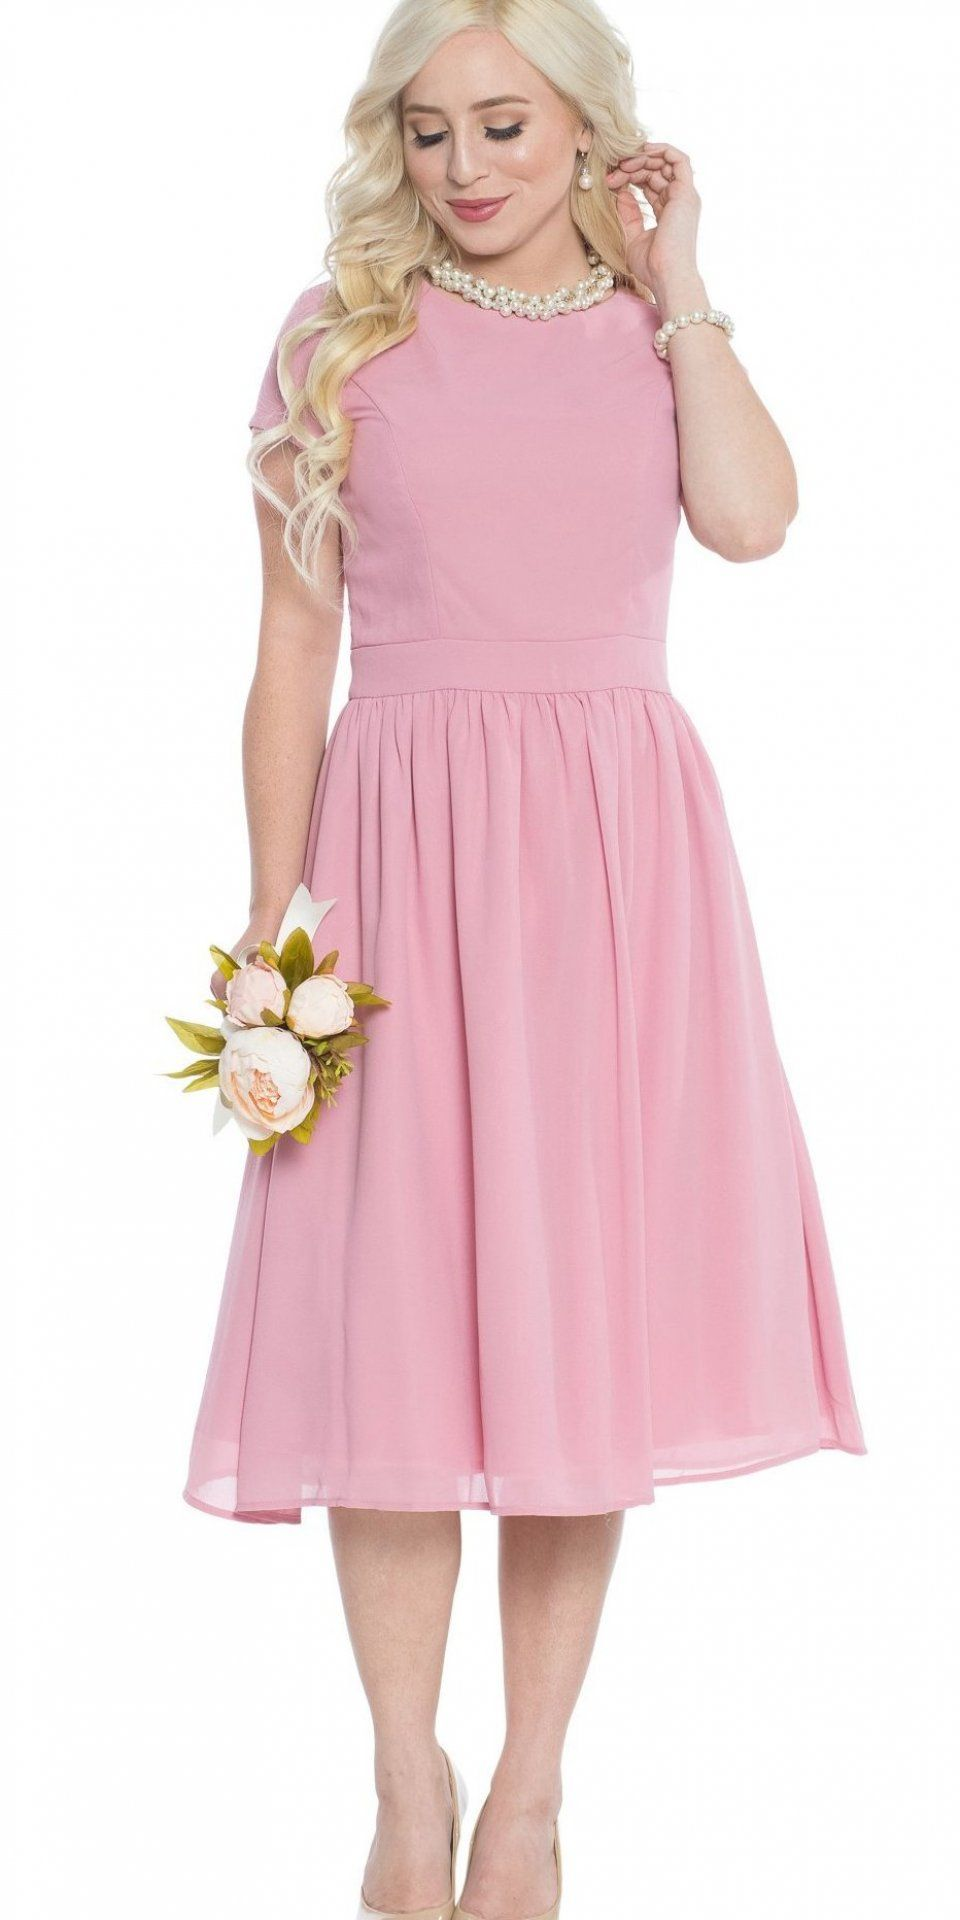 Jen lucy semiformal modest bridesmaid dress in bridal